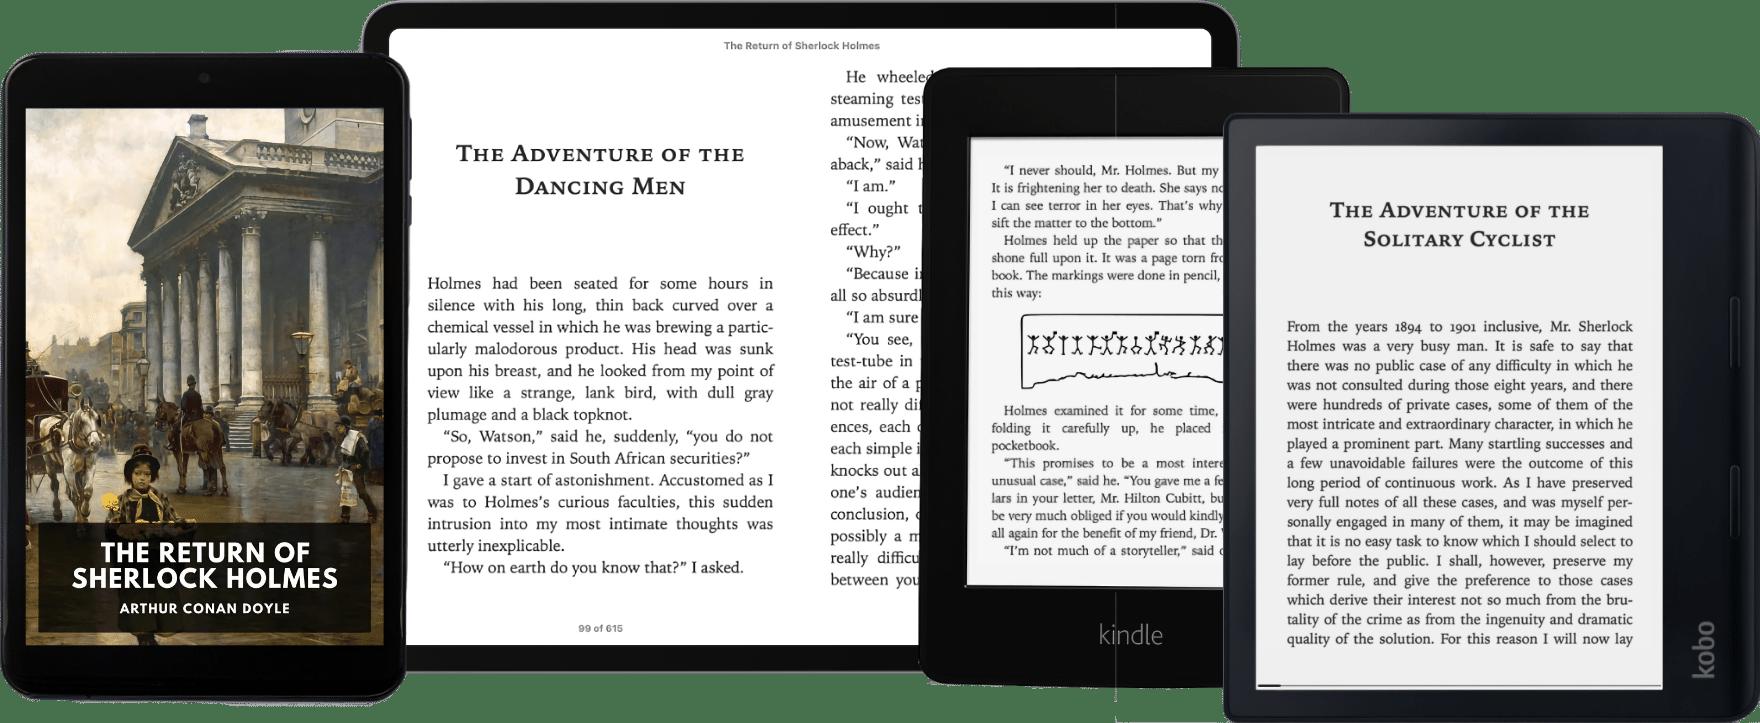 Ereaders with a Standard Ebook open.